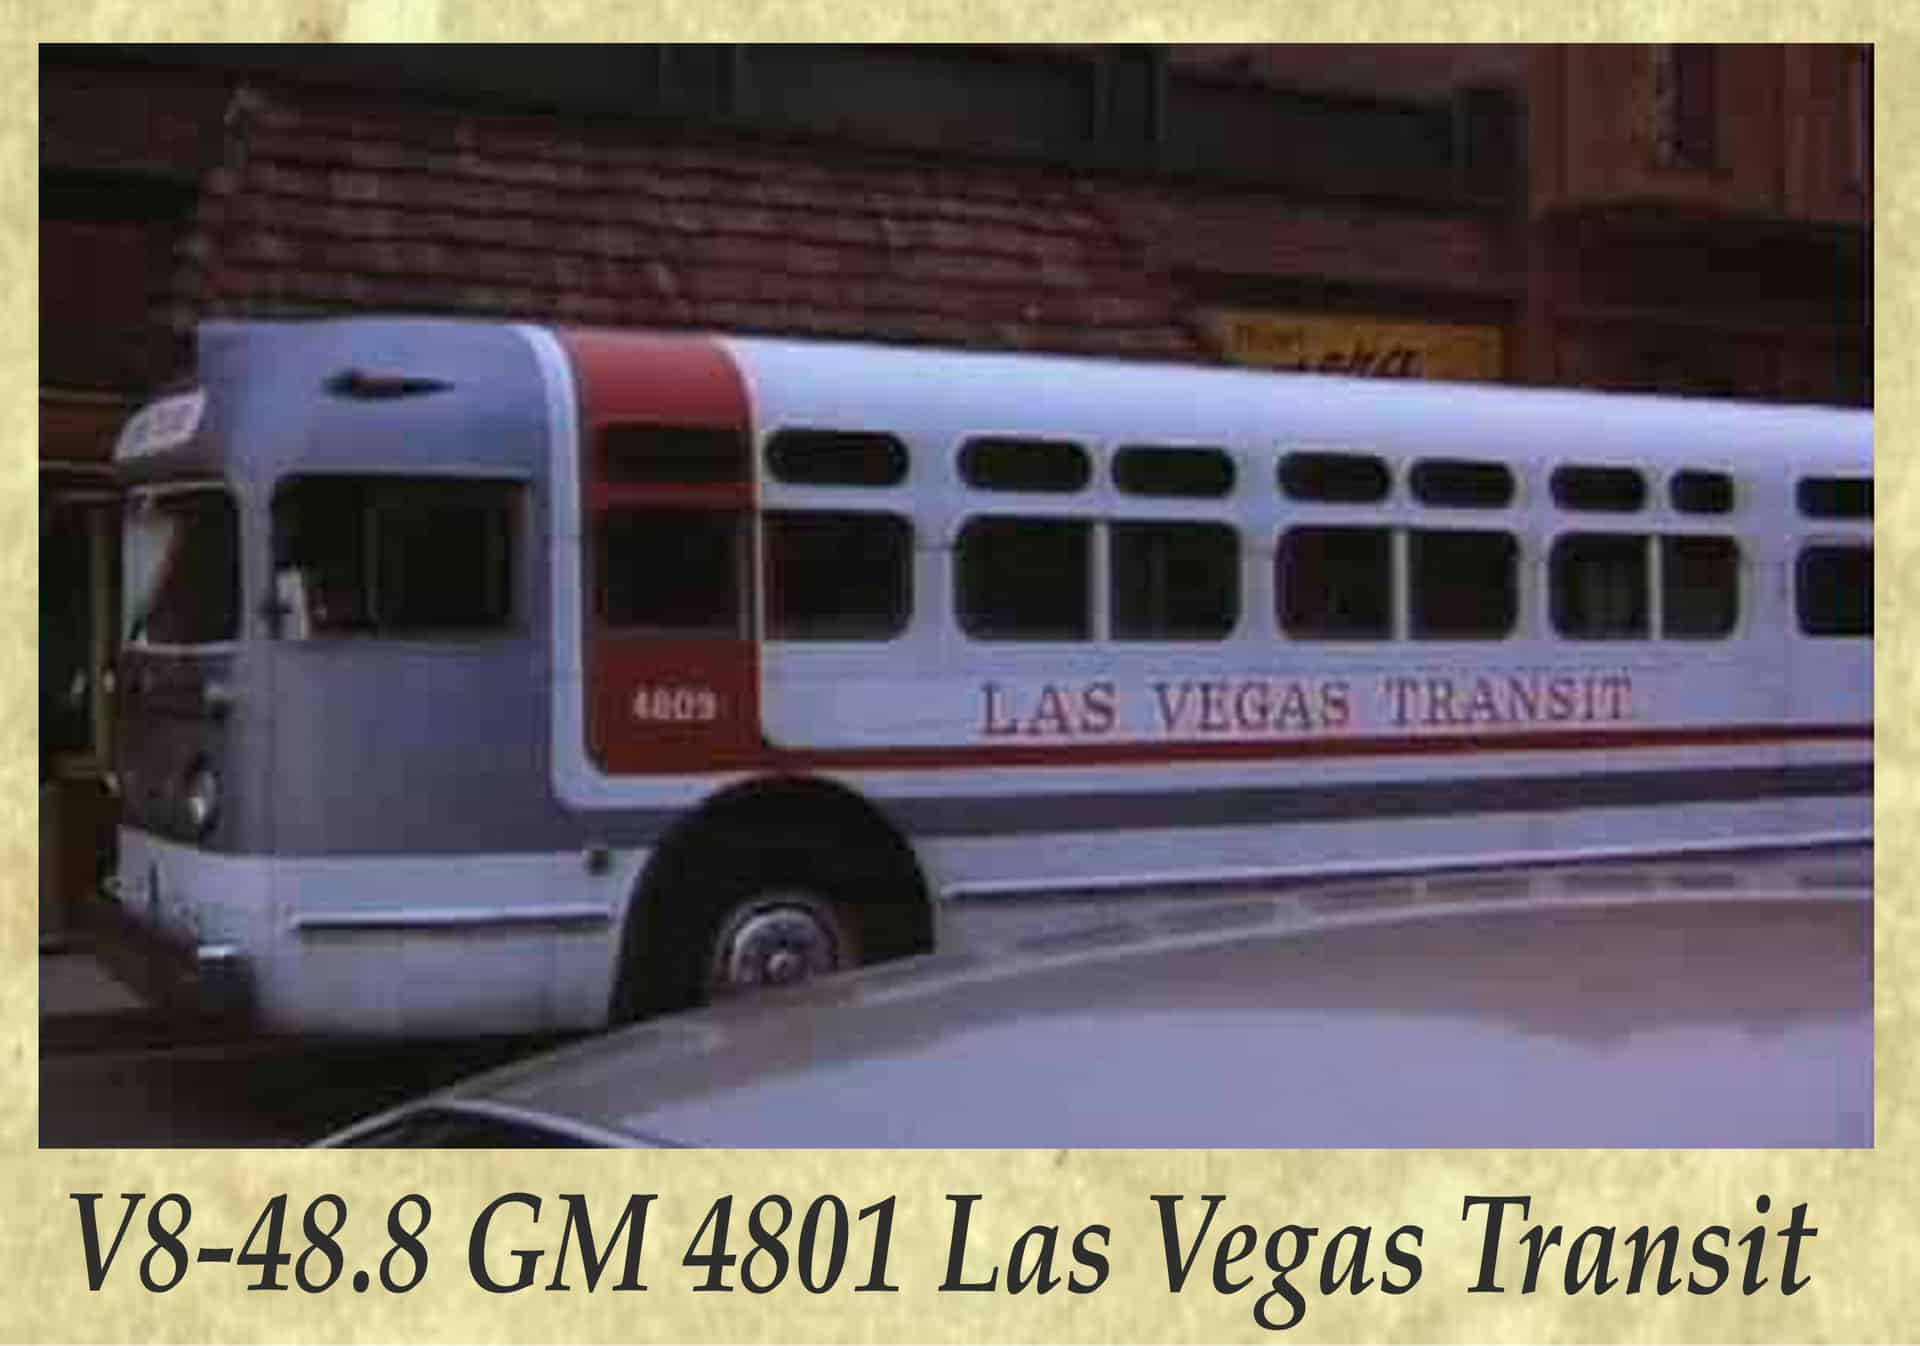 V8-48.8 GM 4801 Las Vegas Transit